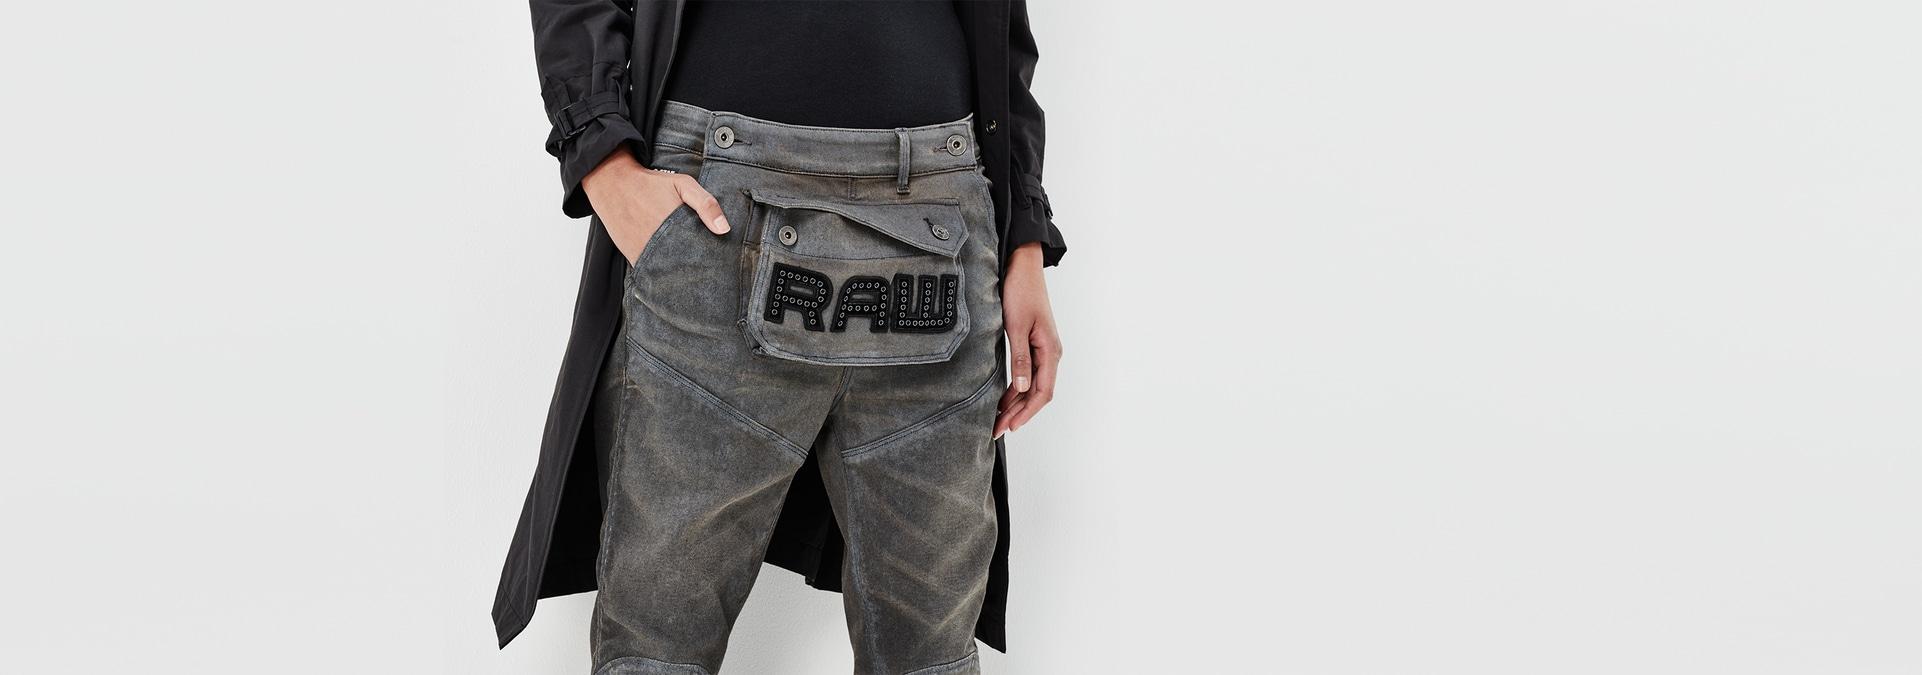 g star raw women jeans 5620 3d pouch high boyfriend. Black Bedroom Furniture Sets. Home Design Ideas